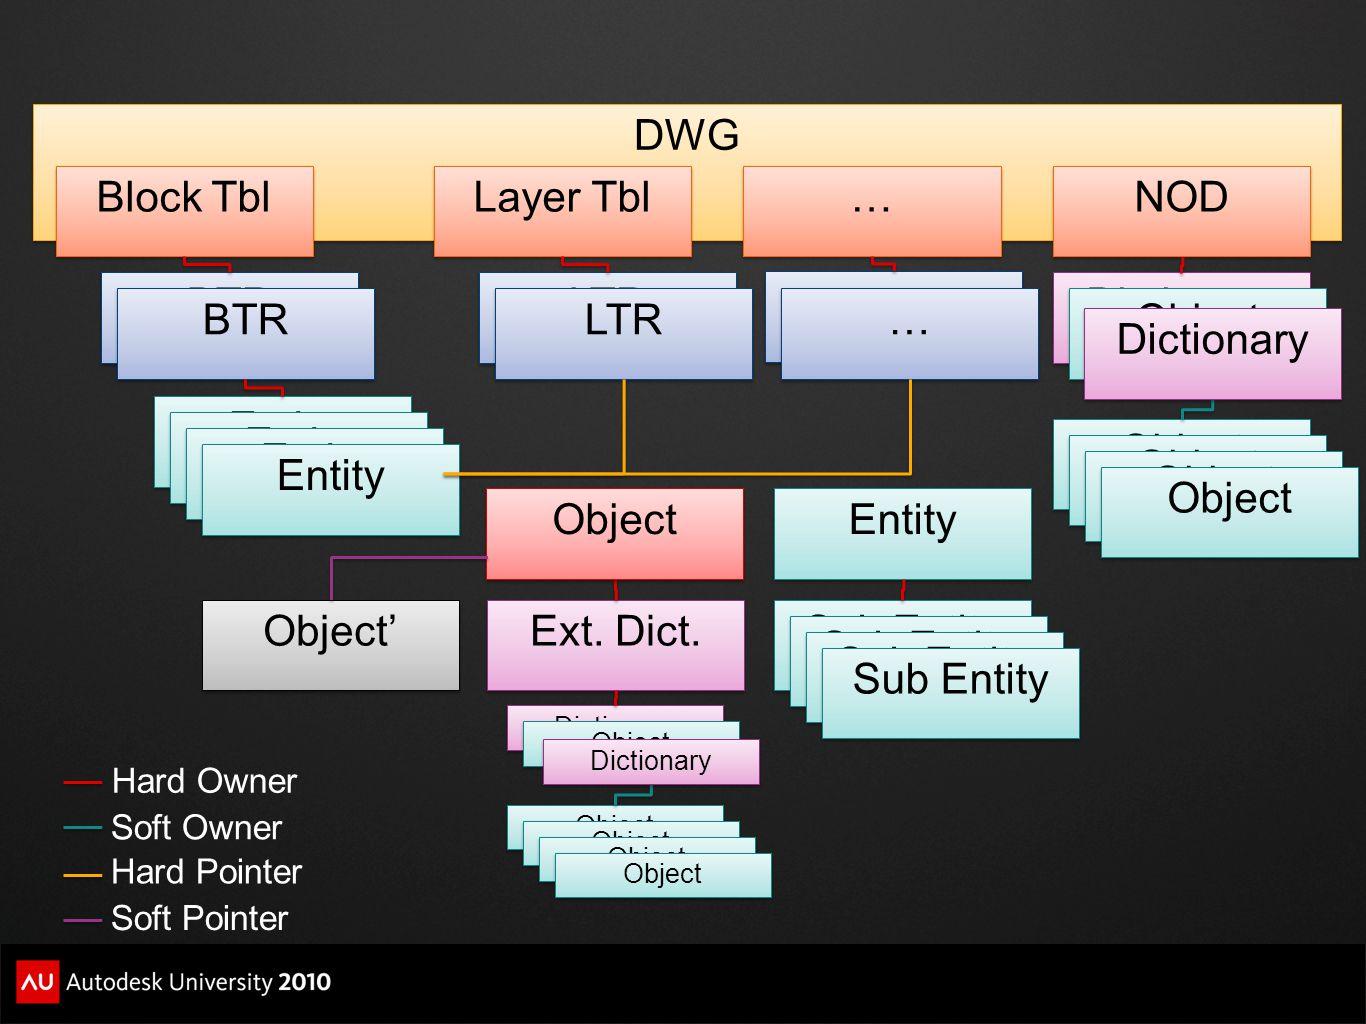 DWG Block Tbl BTR Layer Tbl LTR Entity … … NOD Dictionary Object BTR LTR Object Dictionary Ext. Dict. Object Entity Dictionary Object Dictionary Sub E